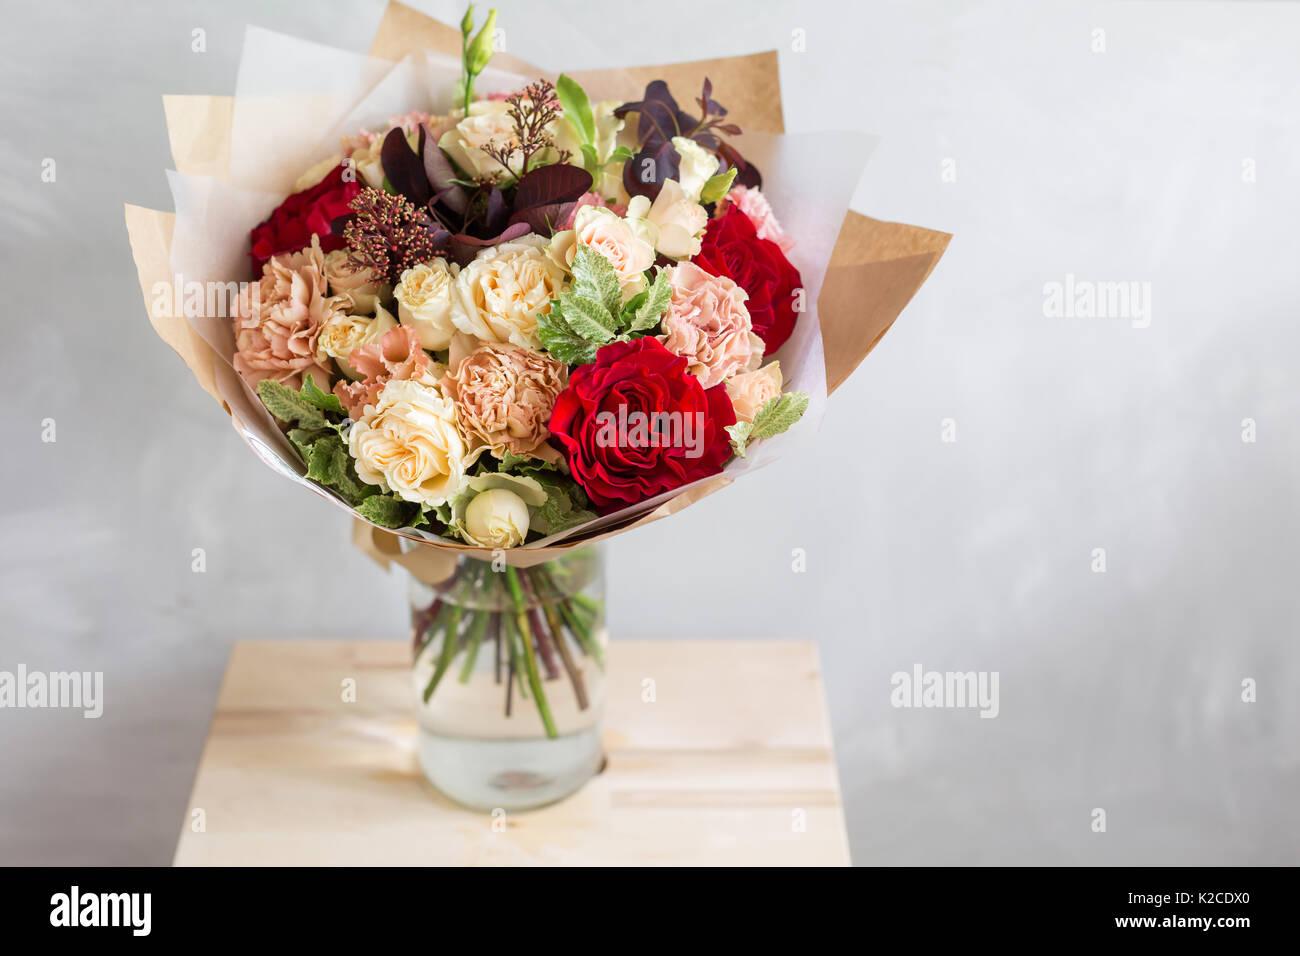 Bouquet in kraft paper a simple bouquet of flowers and greens stock bouquet in kraft paper a simple bouquet of flowers and greens izmirmasajfo